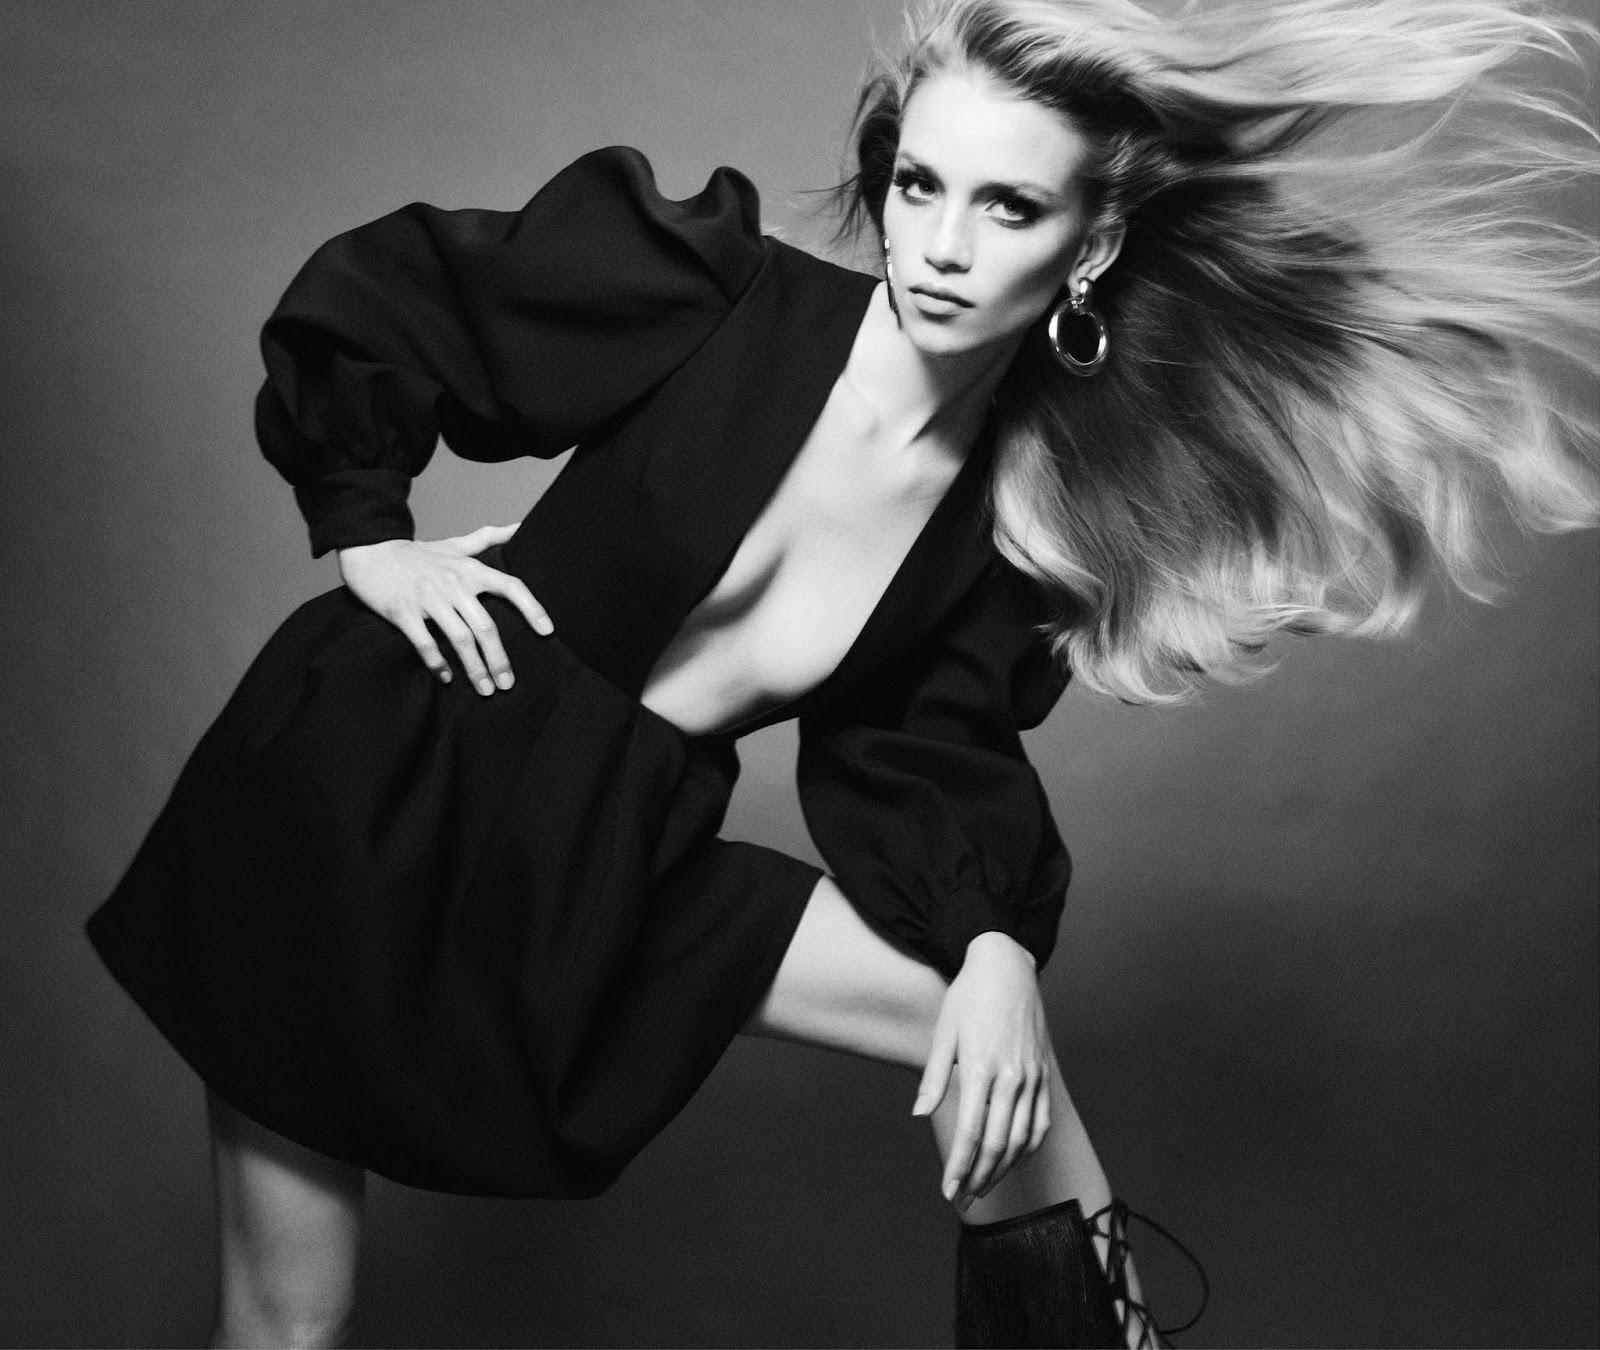 Rebecca Longendyke Vittoria Ceretti In Vogue Paris March 2020 By Images, Photos, Reviews